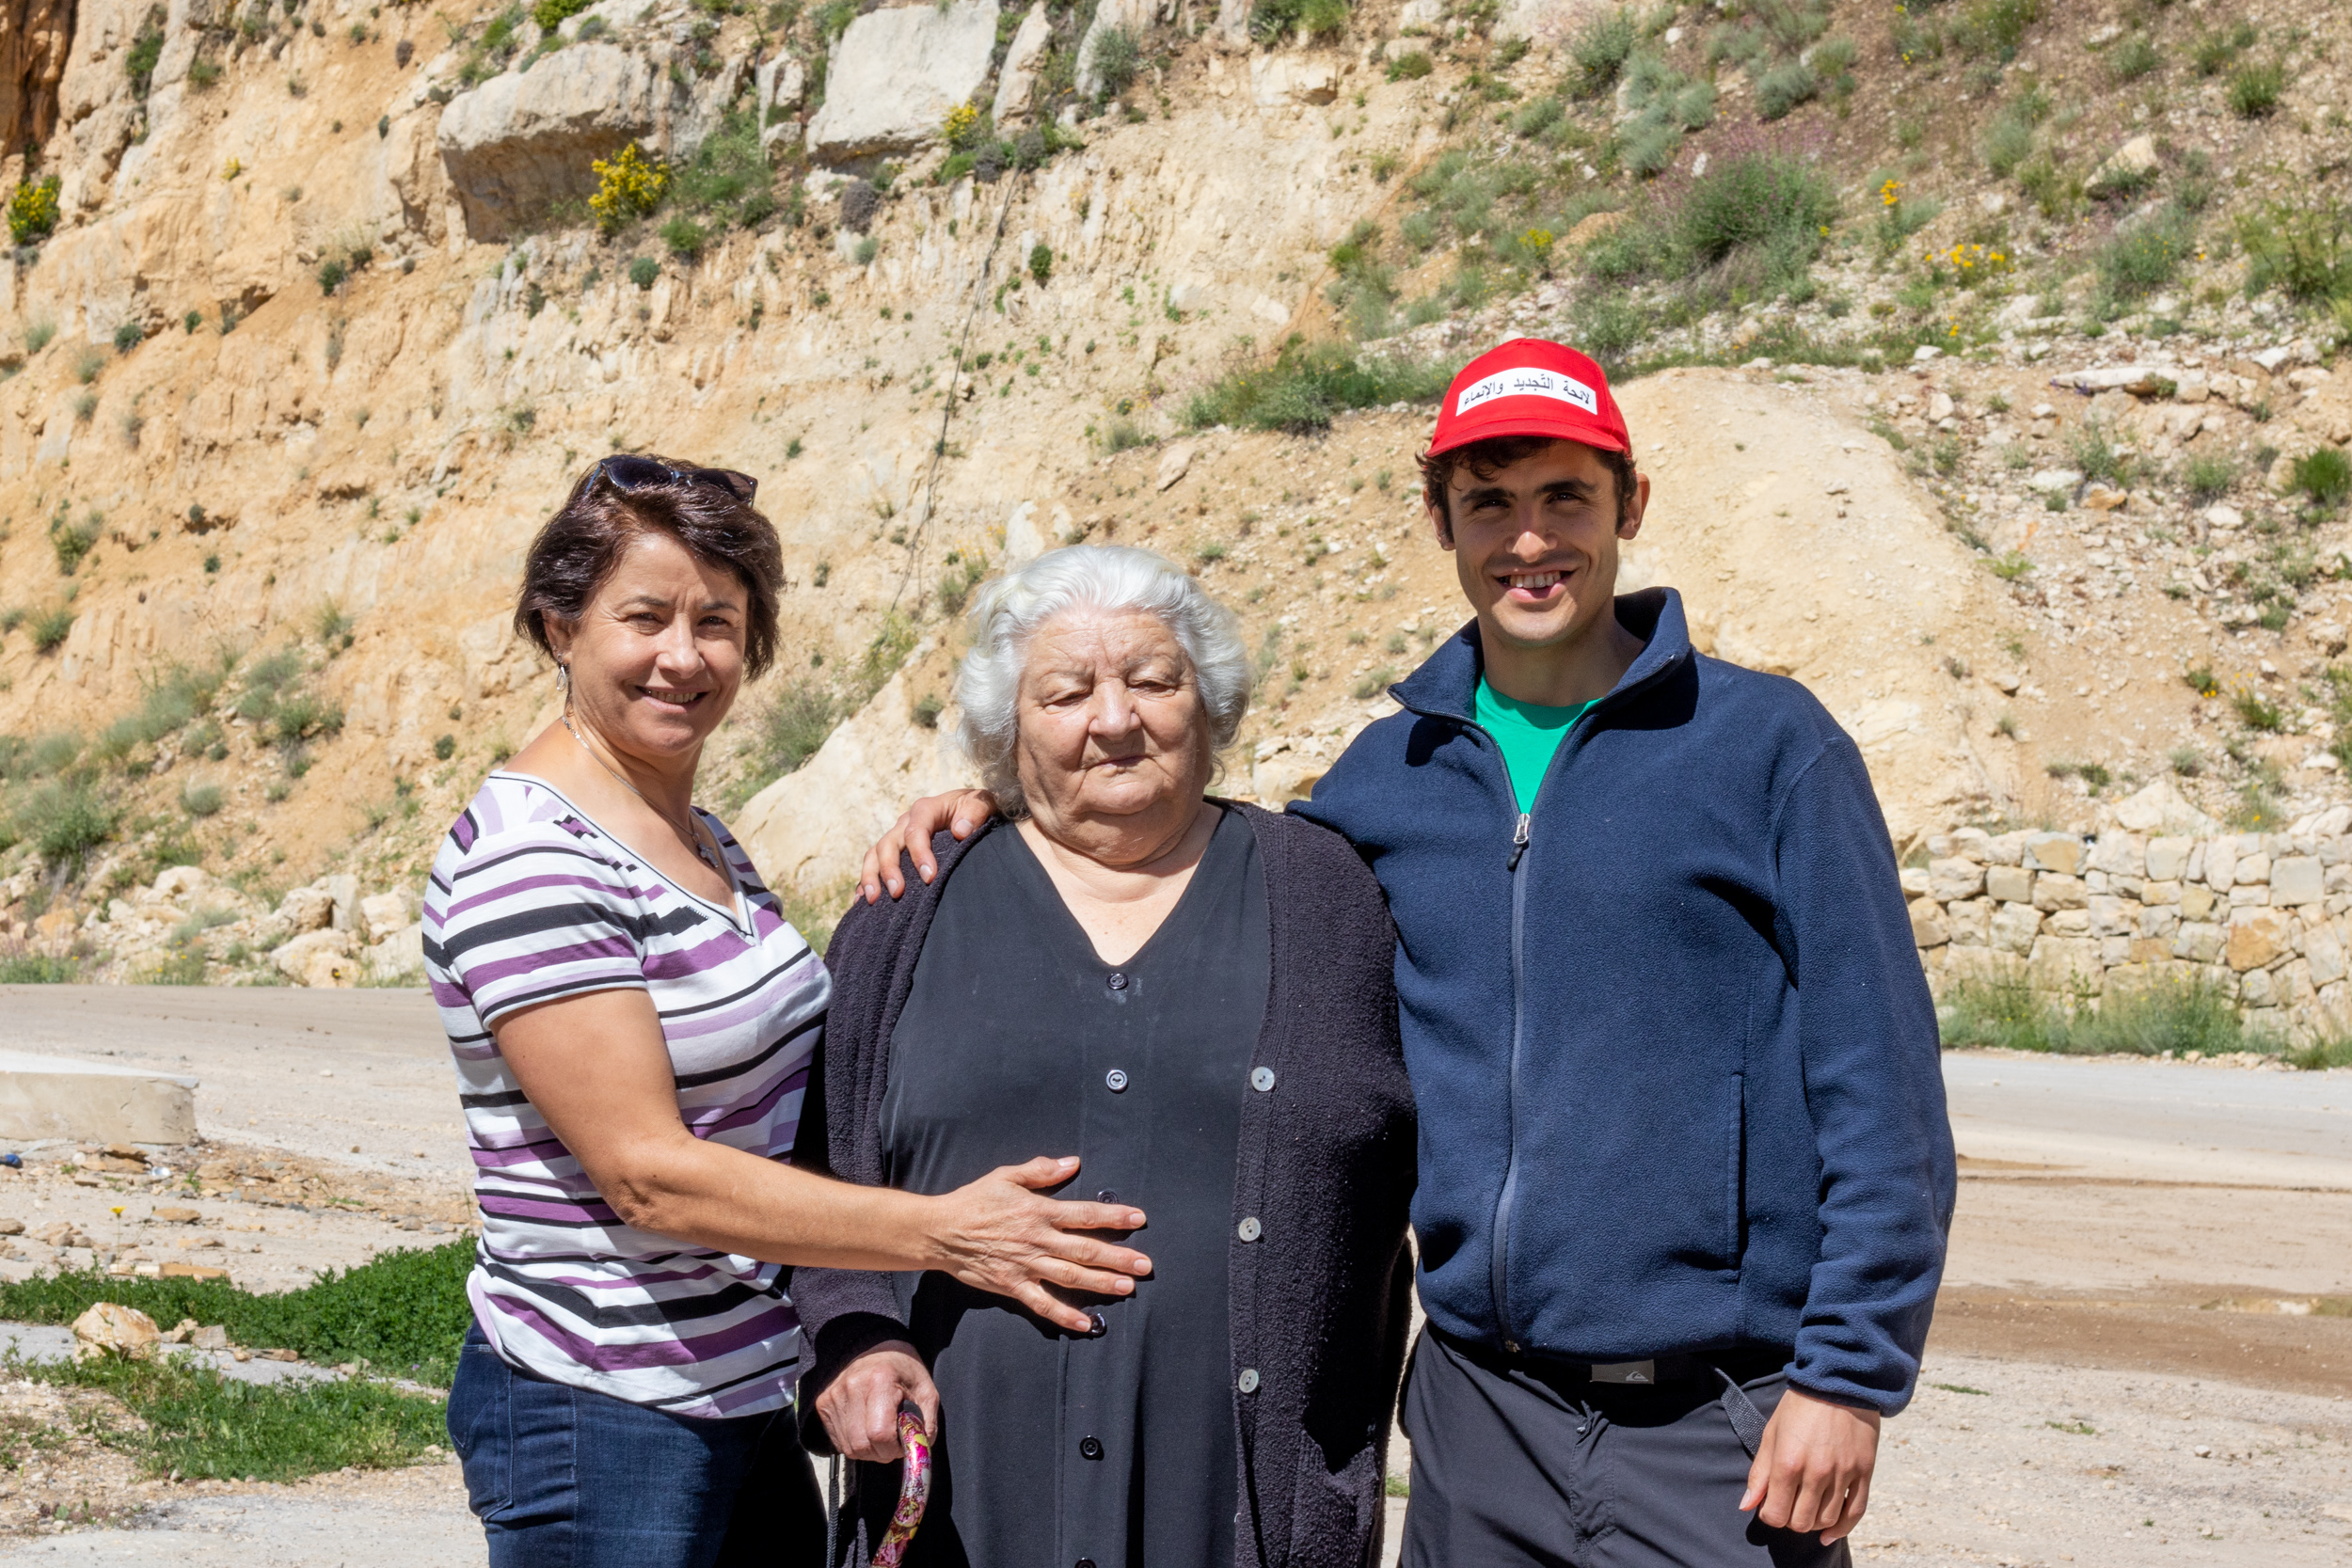 Visiting Church w/ Grandma & Mom